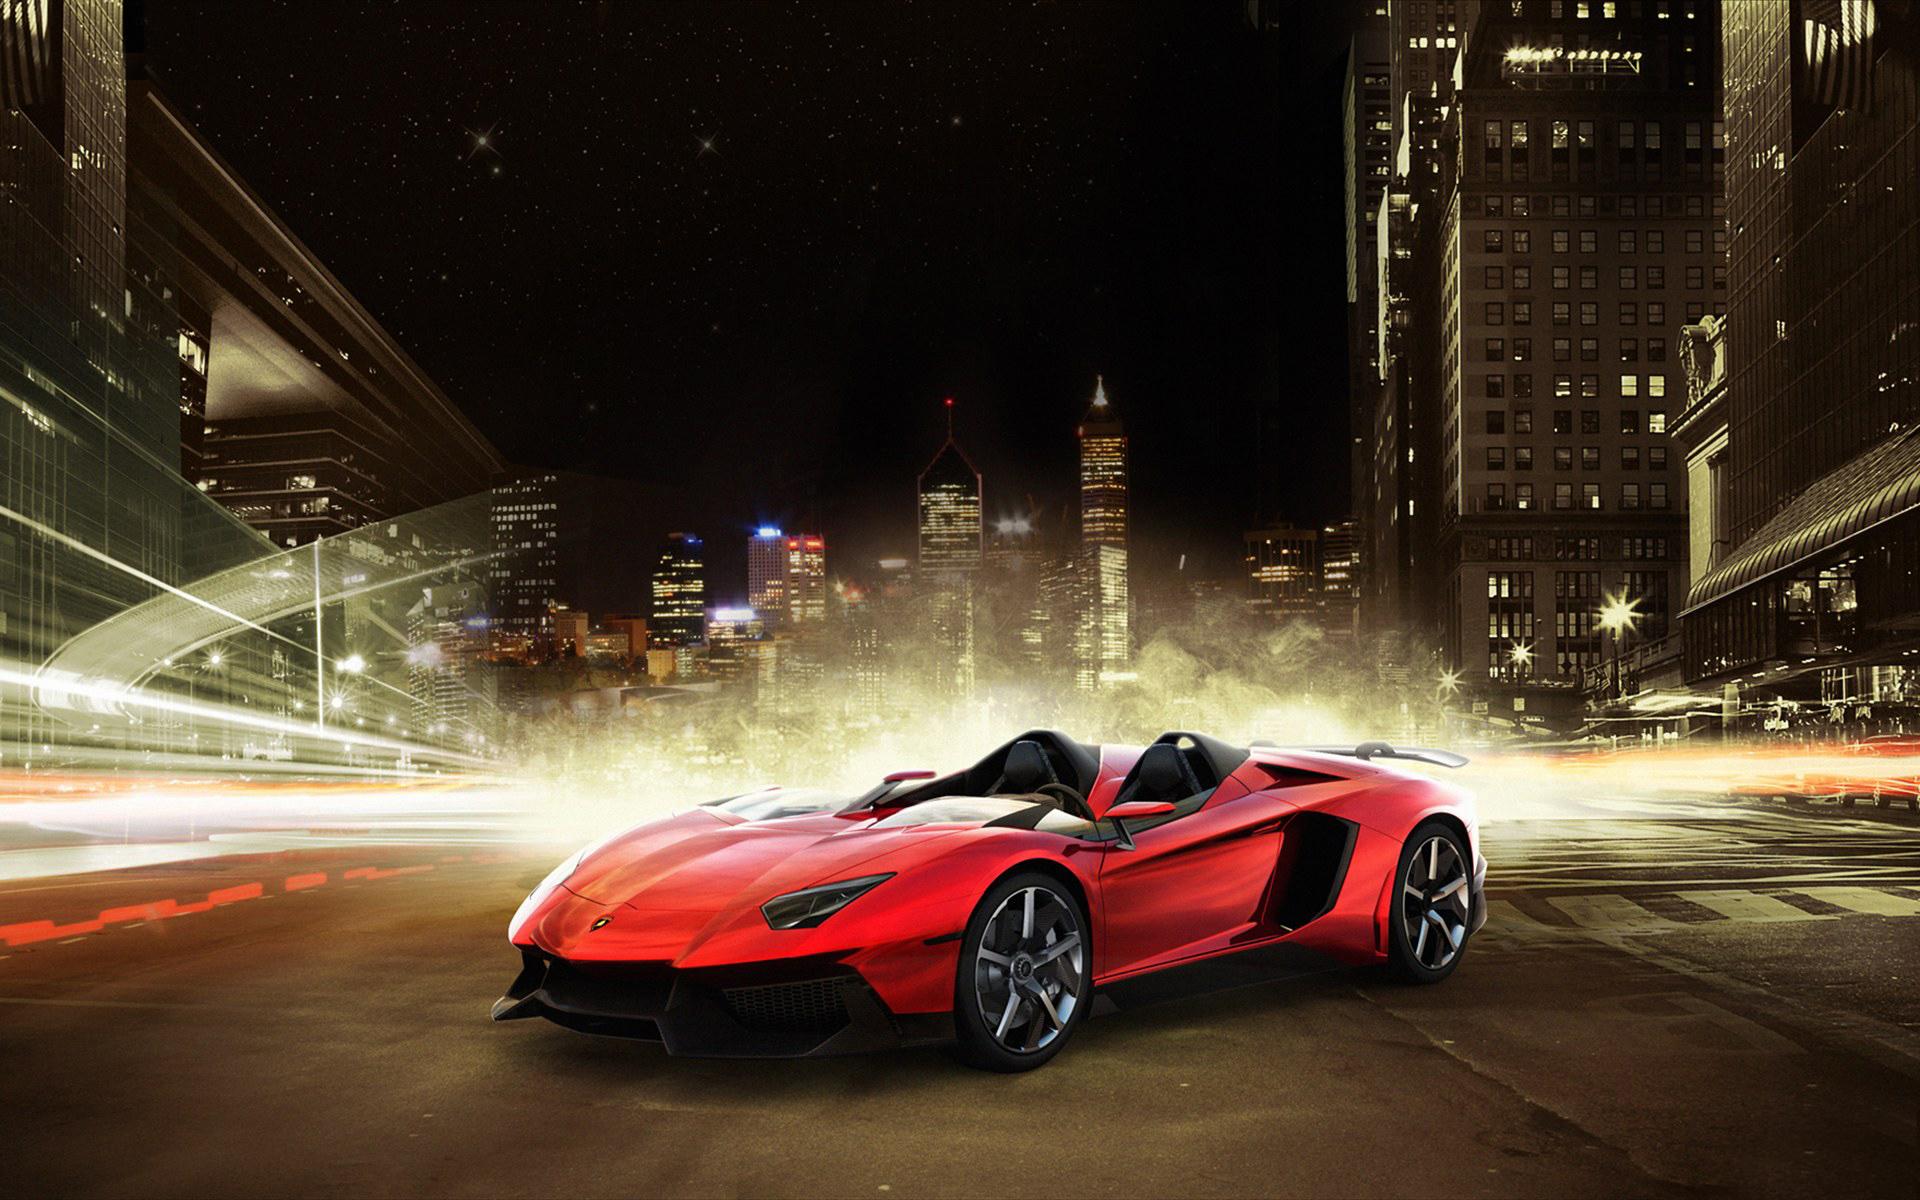 Gta Car Wallpaper 2012 Lamborghini Aventador J Wallpaper Hd Car Wallpapers